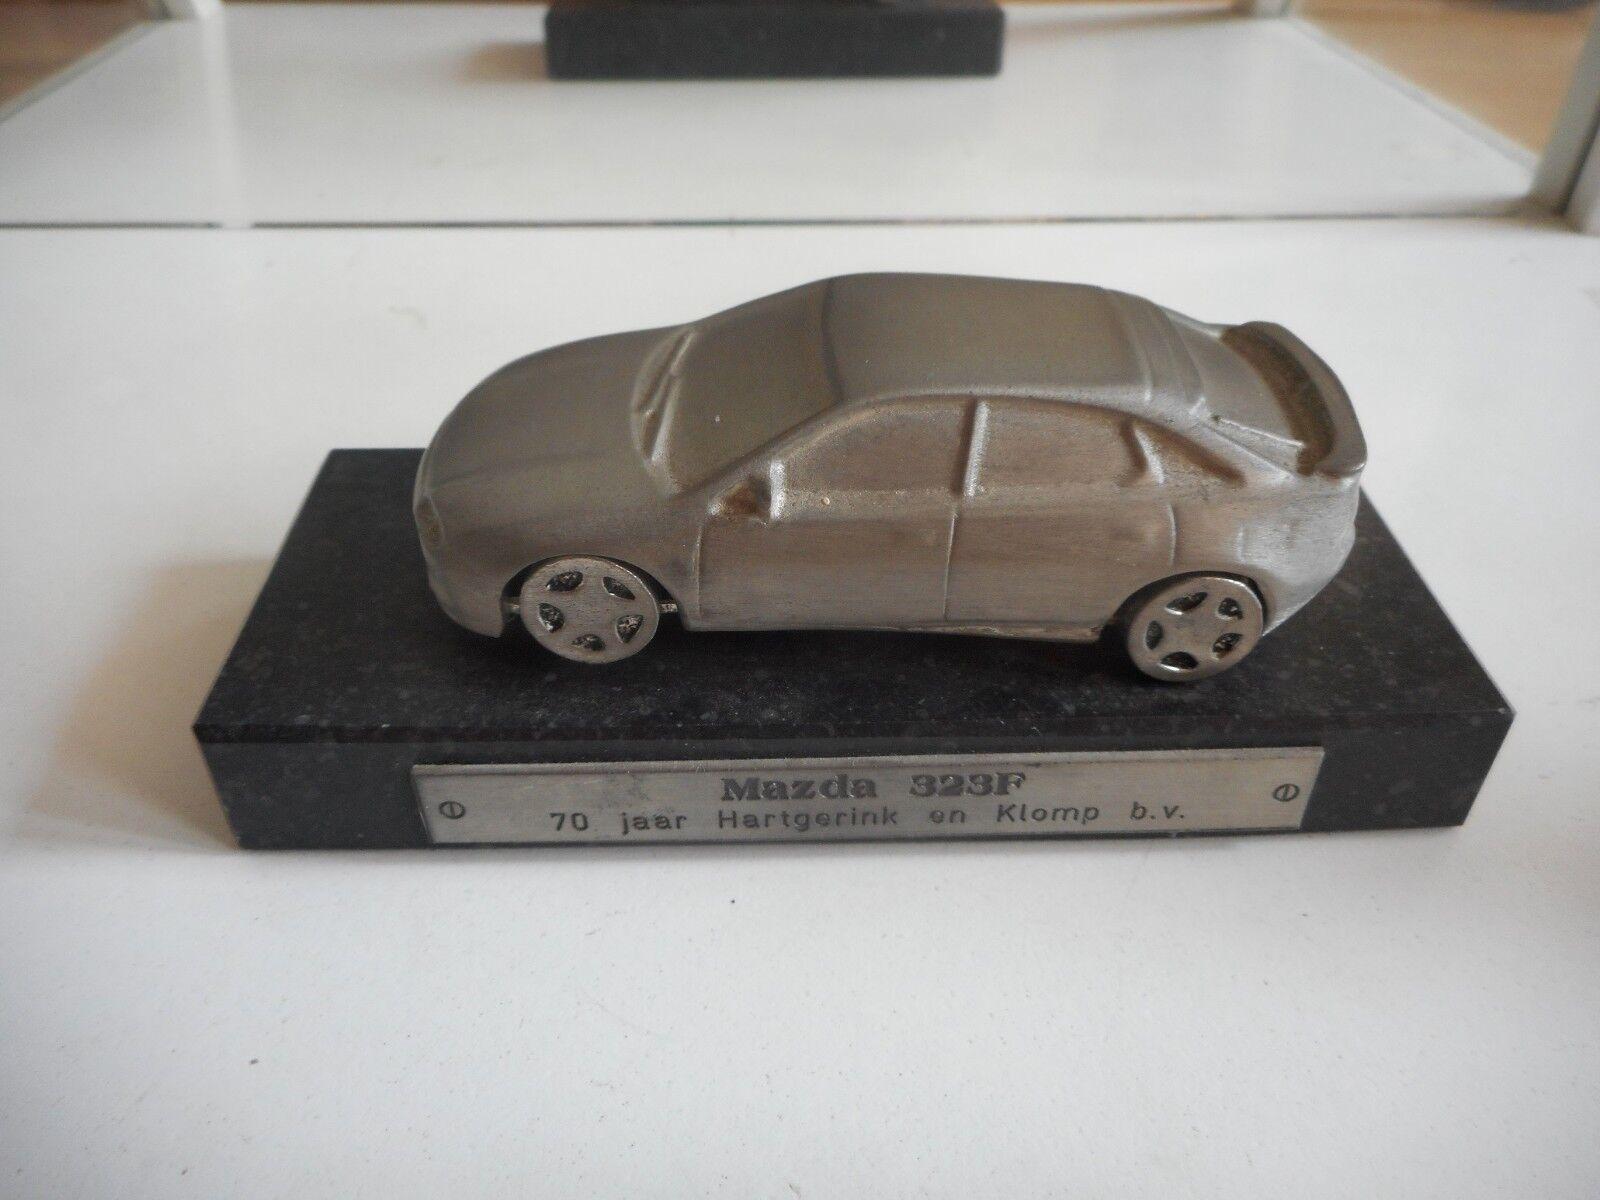 Mazda Dealer Gift statue metal Mazda 323F on stone base